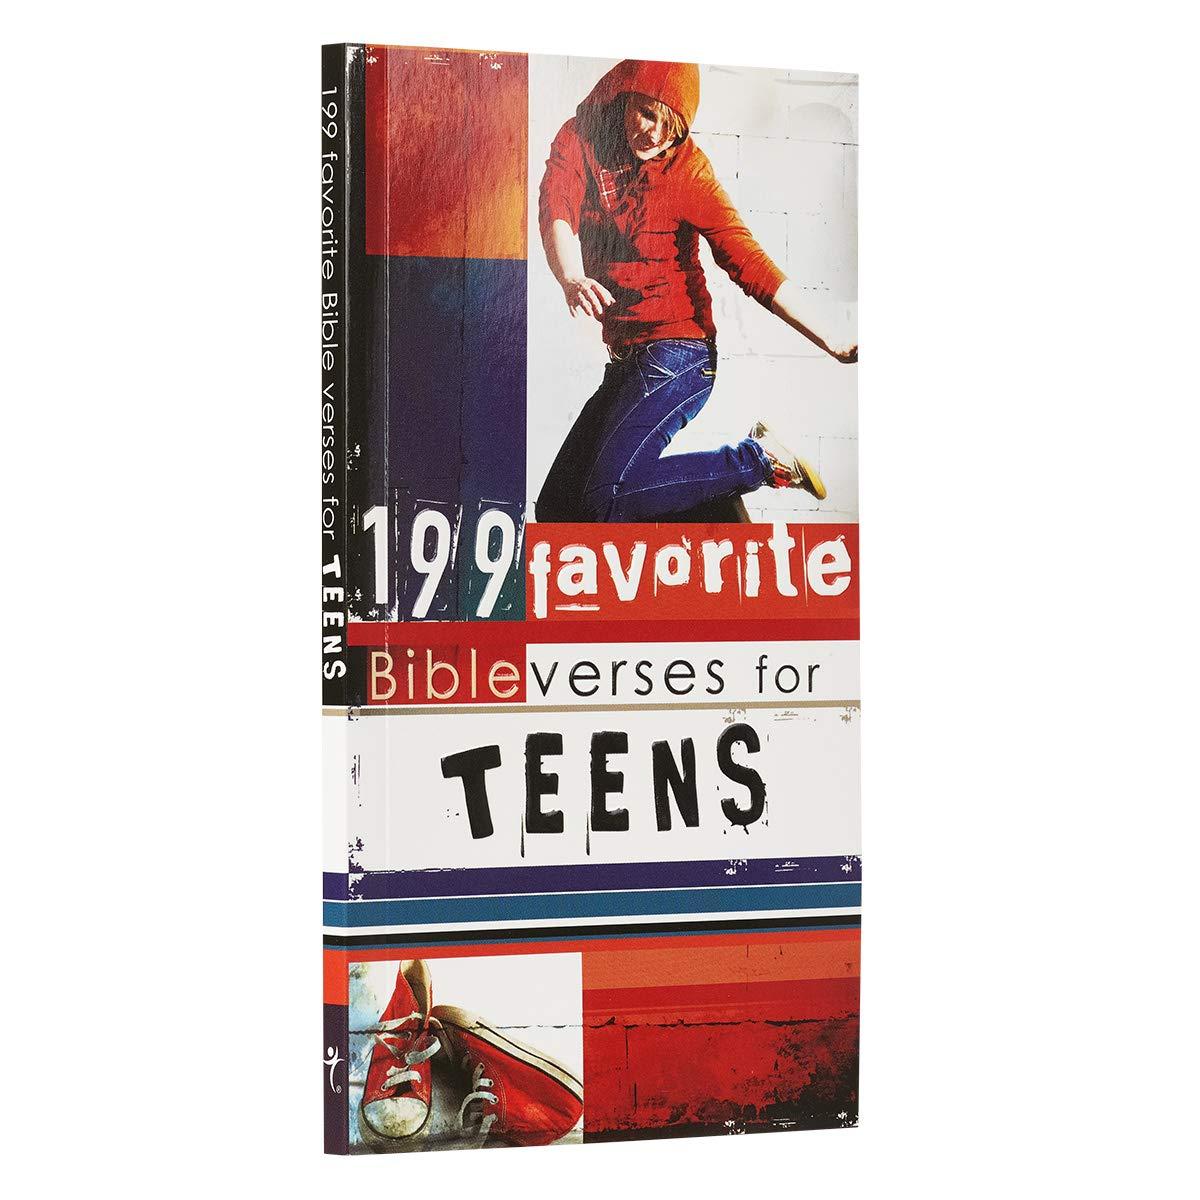 Amazon.com: 199 Favorite Bible Verses for Teens (199 Favorite Bible Verses  For...) (8601423134833): Christian Art Gifts: Books